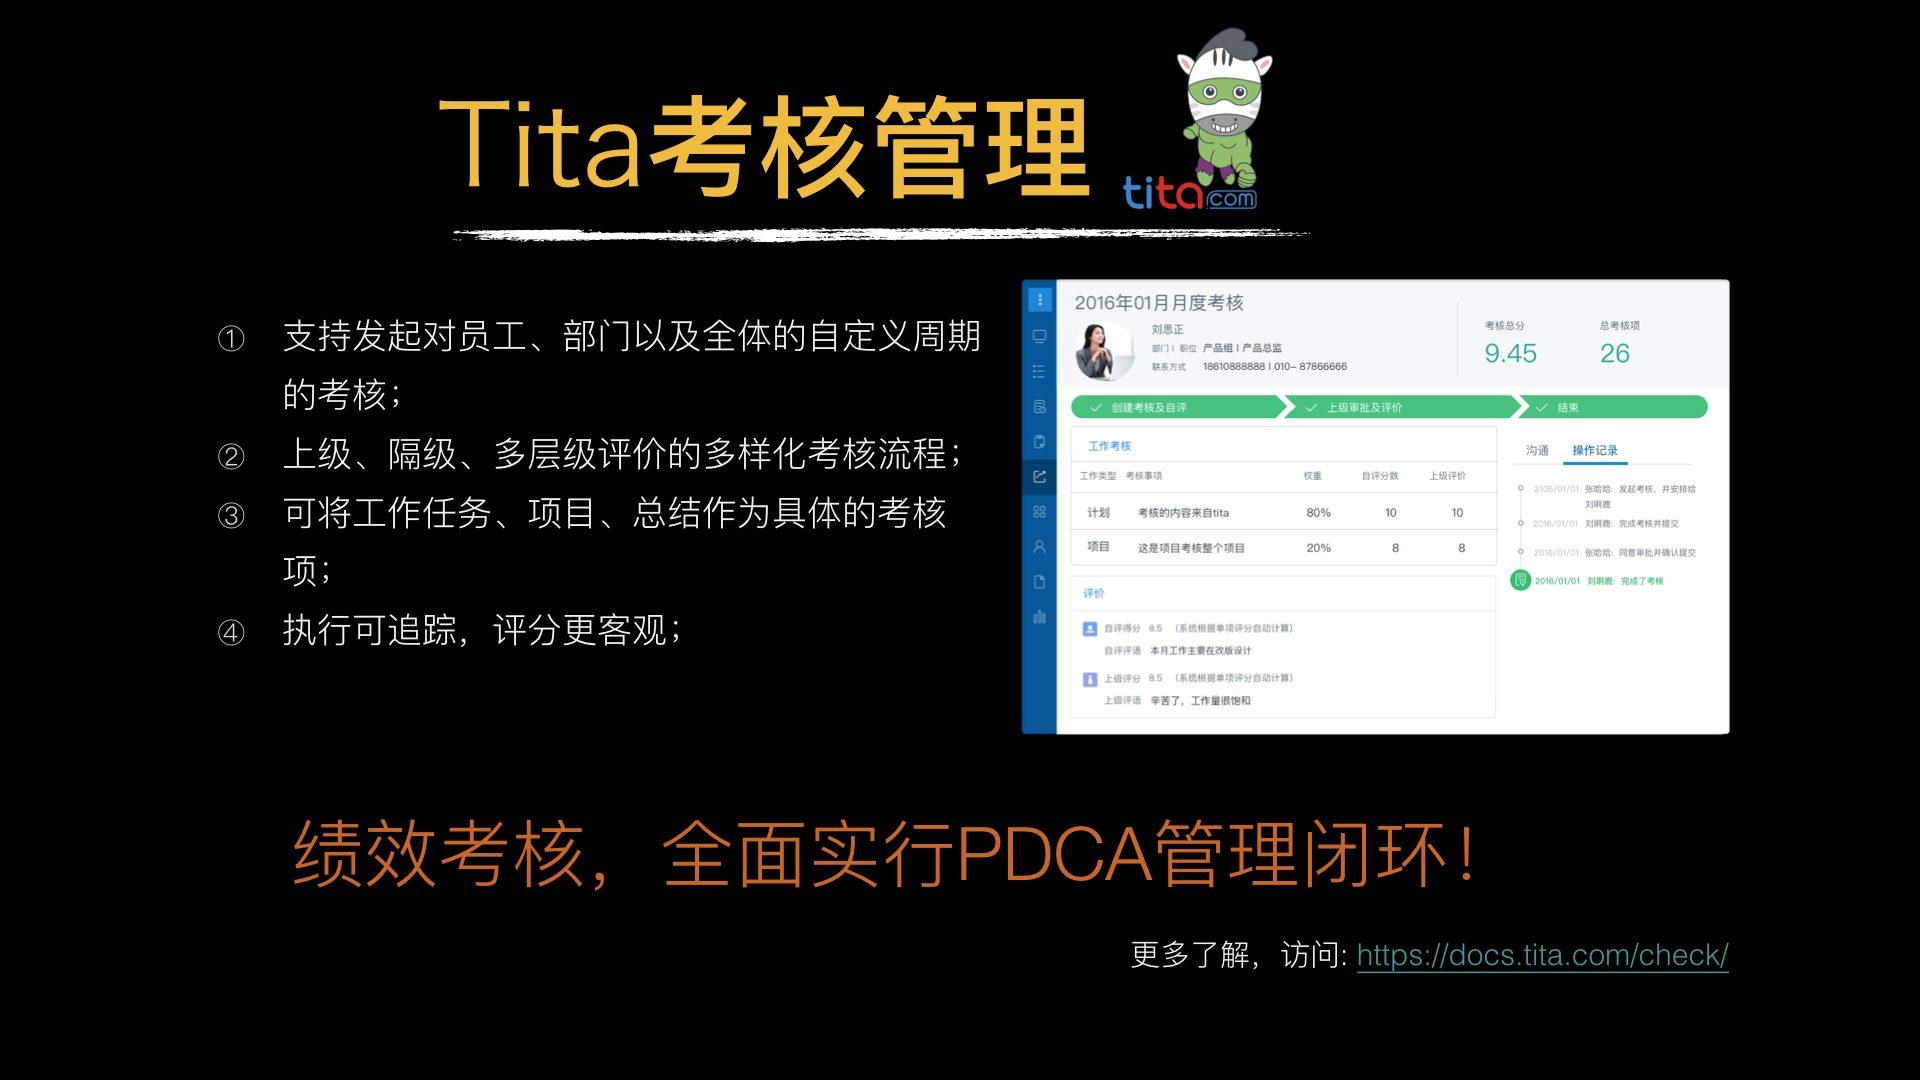 绩效考核   tita.com